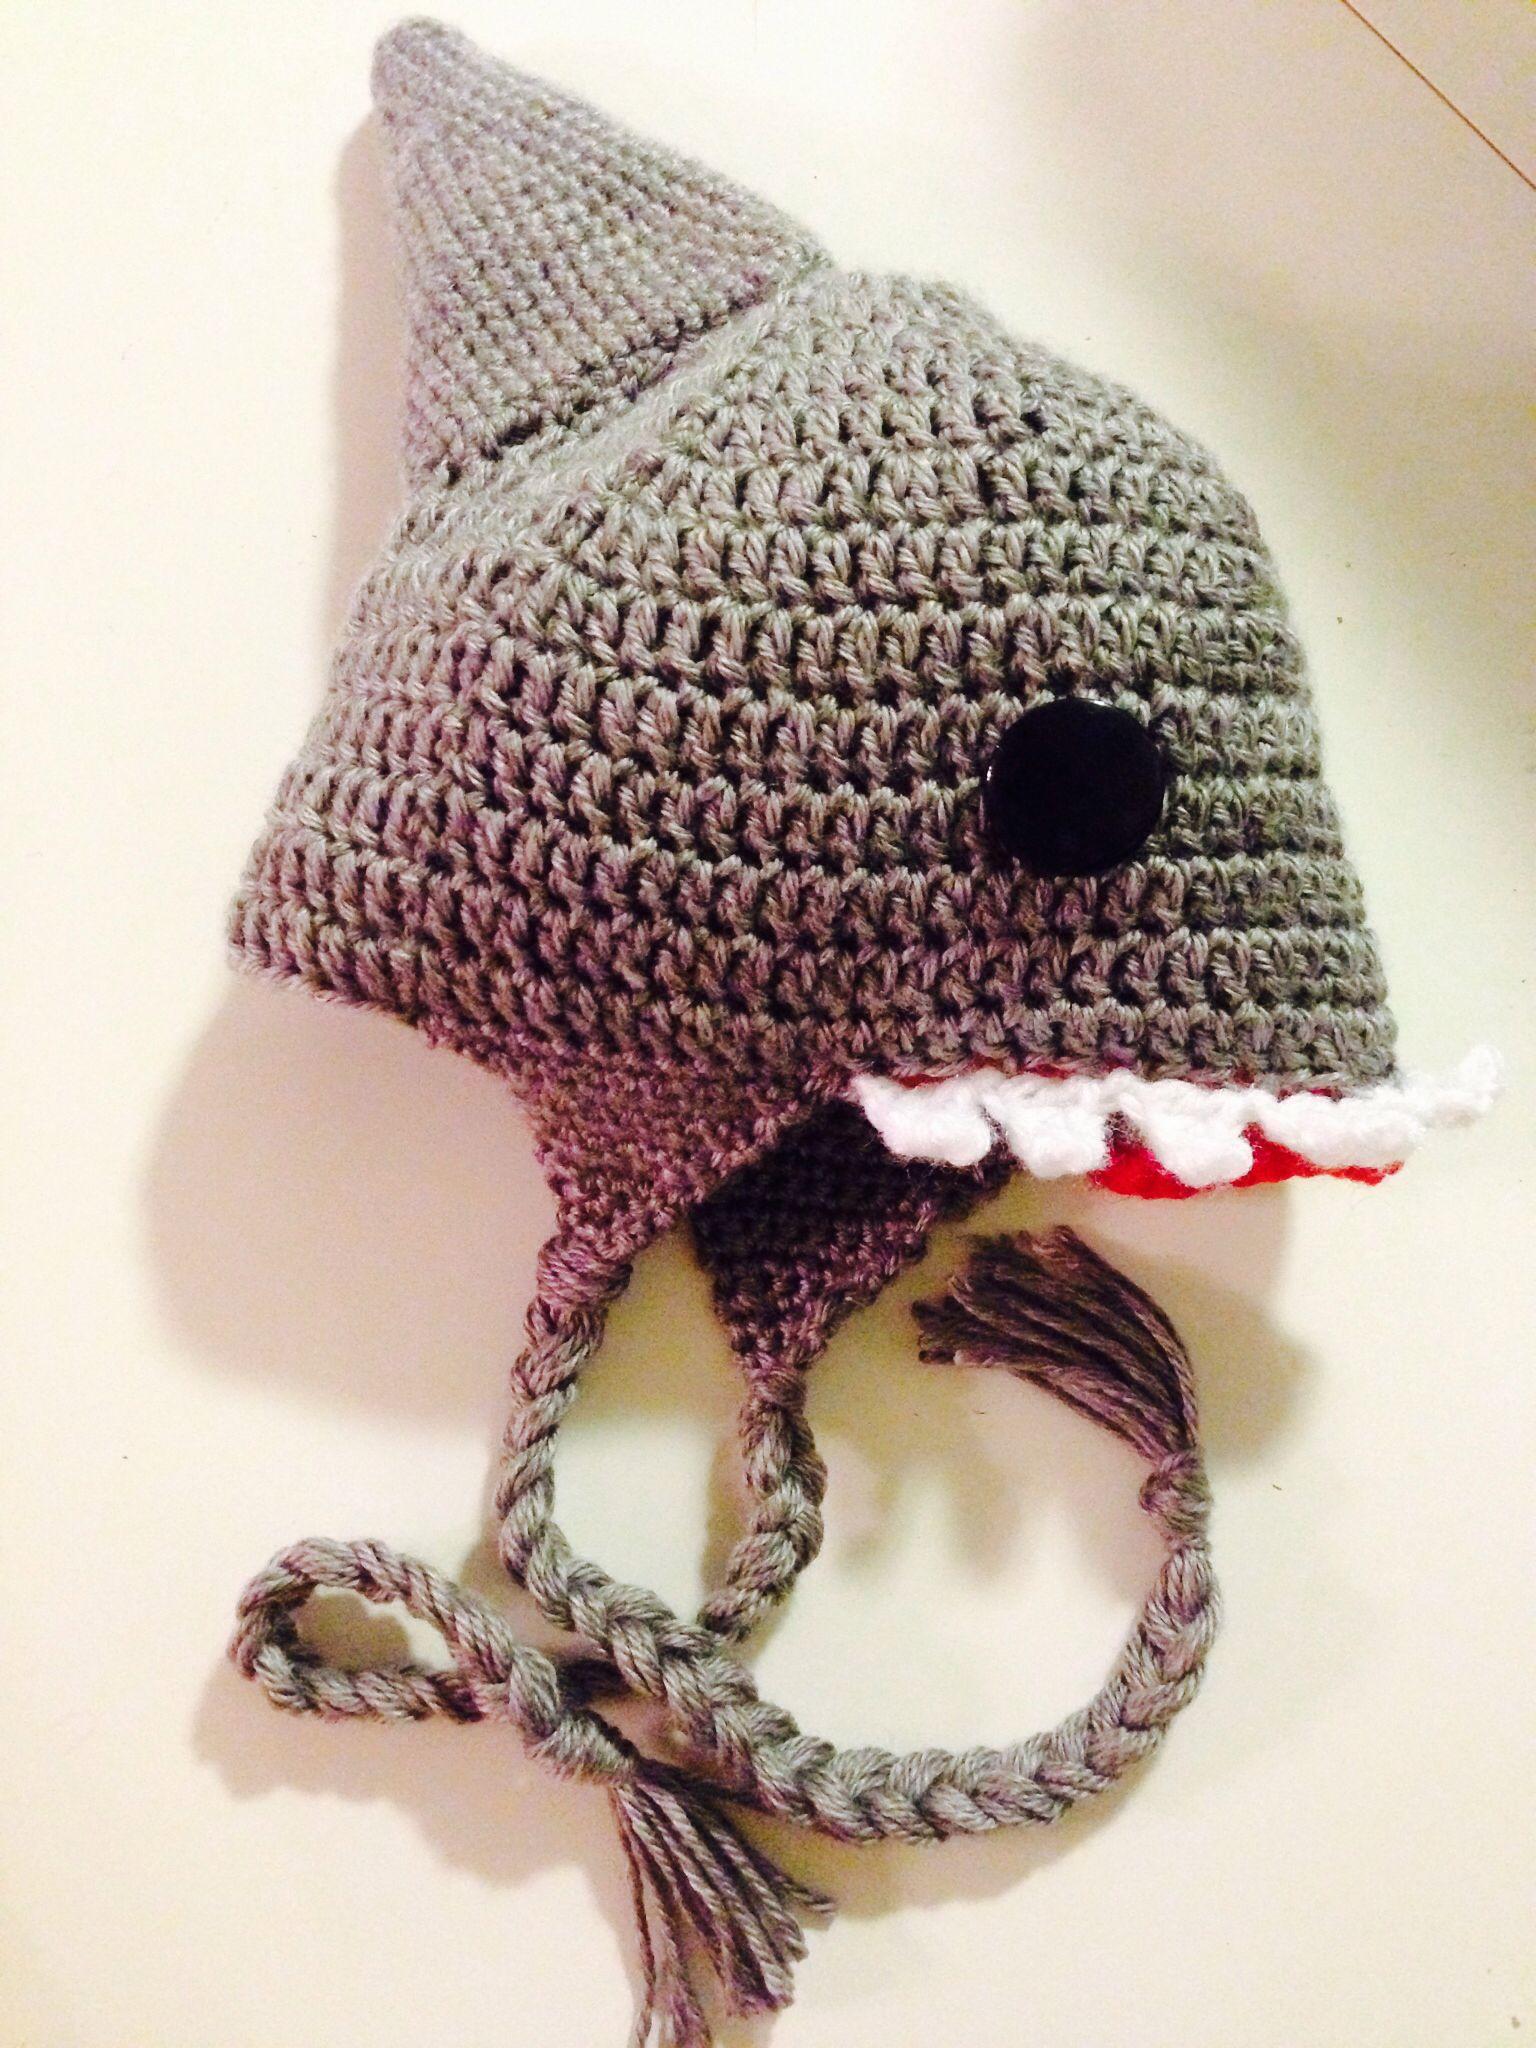 Crochet Shark Hat Pattern | Pinterest